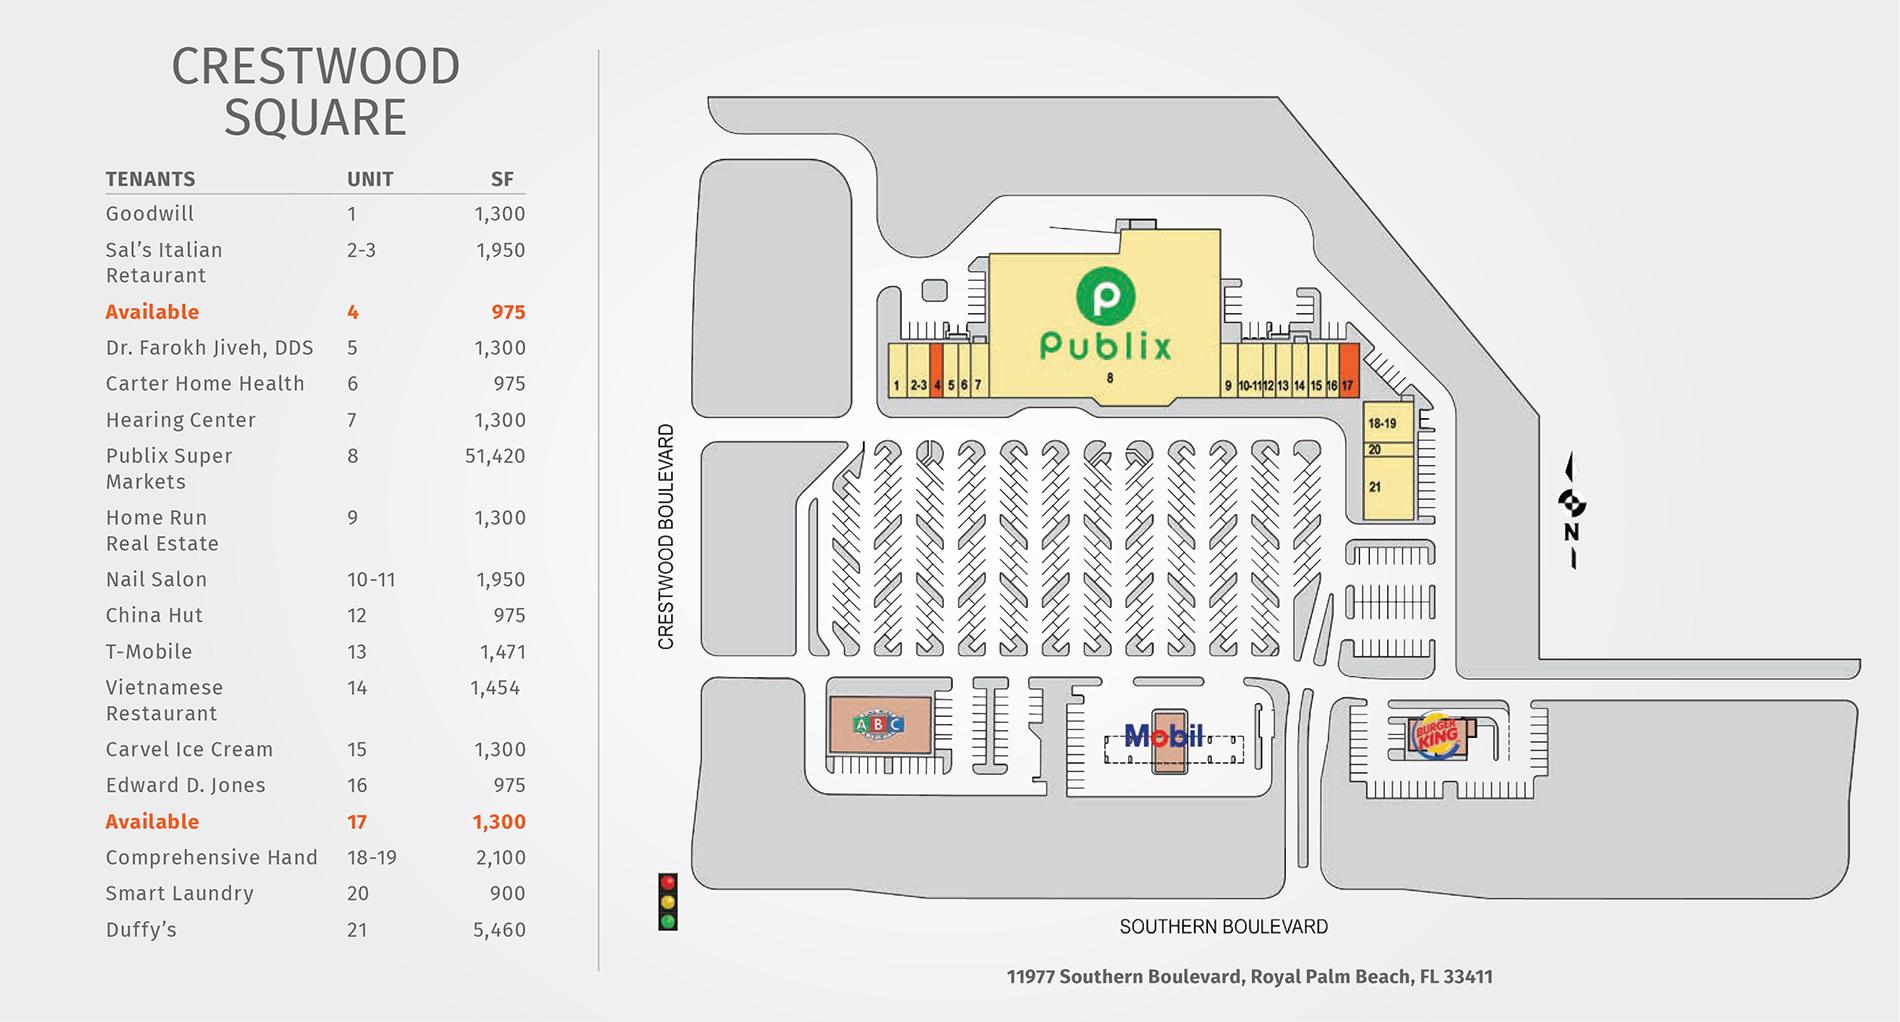 Crestwood Square site plan